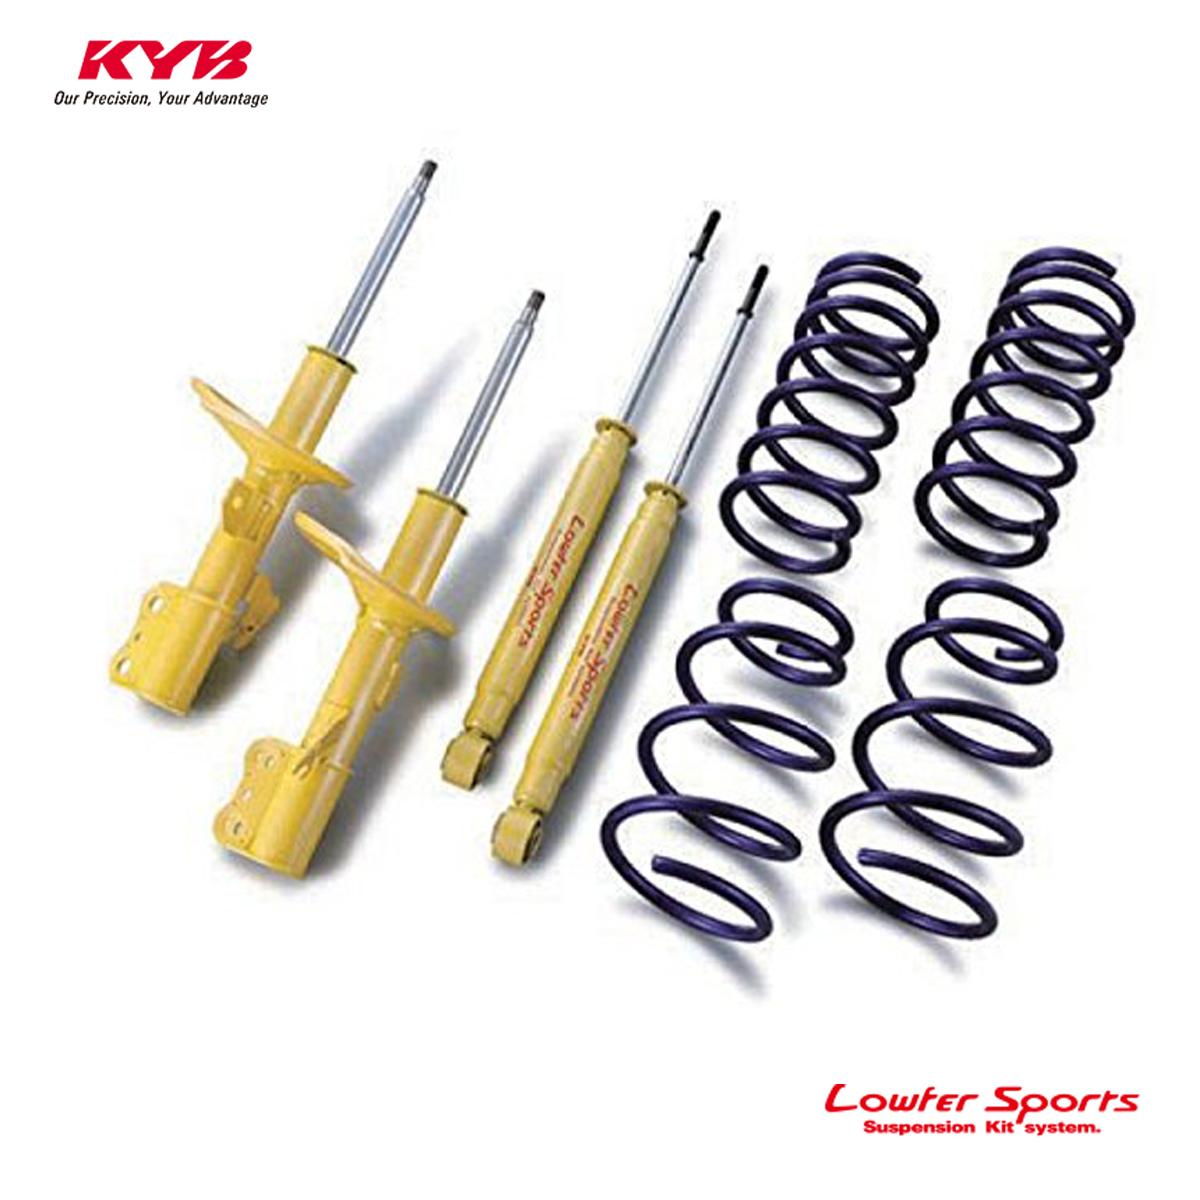 KYB カヤバ エルグランド APE50 ショックアブソーバー サスペンションキット Lowfer Sports LKIT-E5016 配送先条件有り